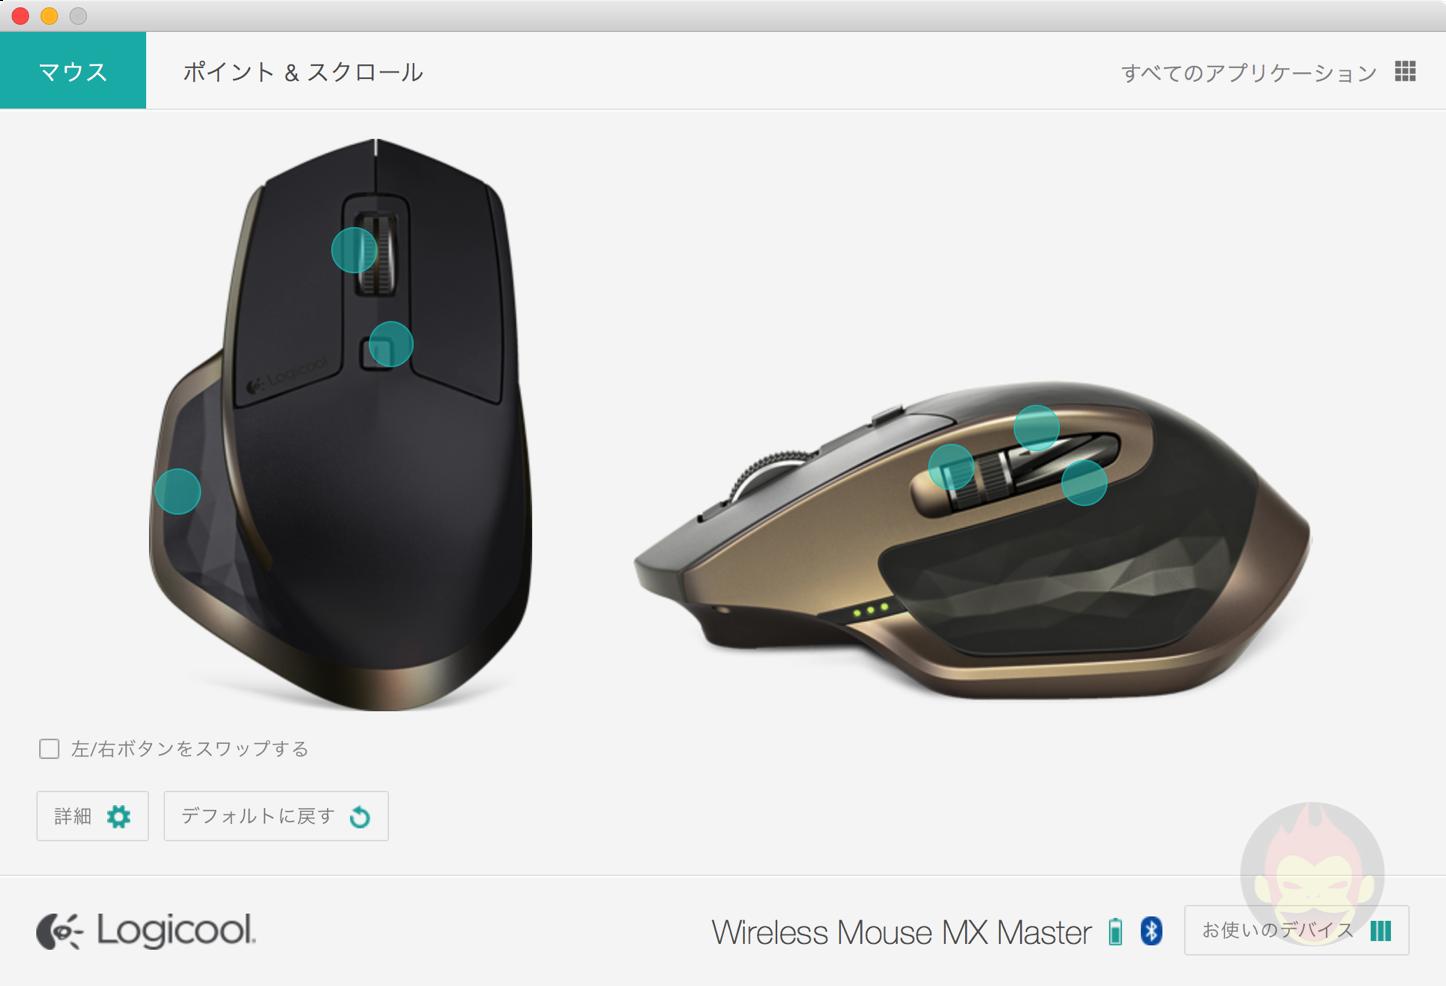 Logicool MX Master MX2000 Mouse